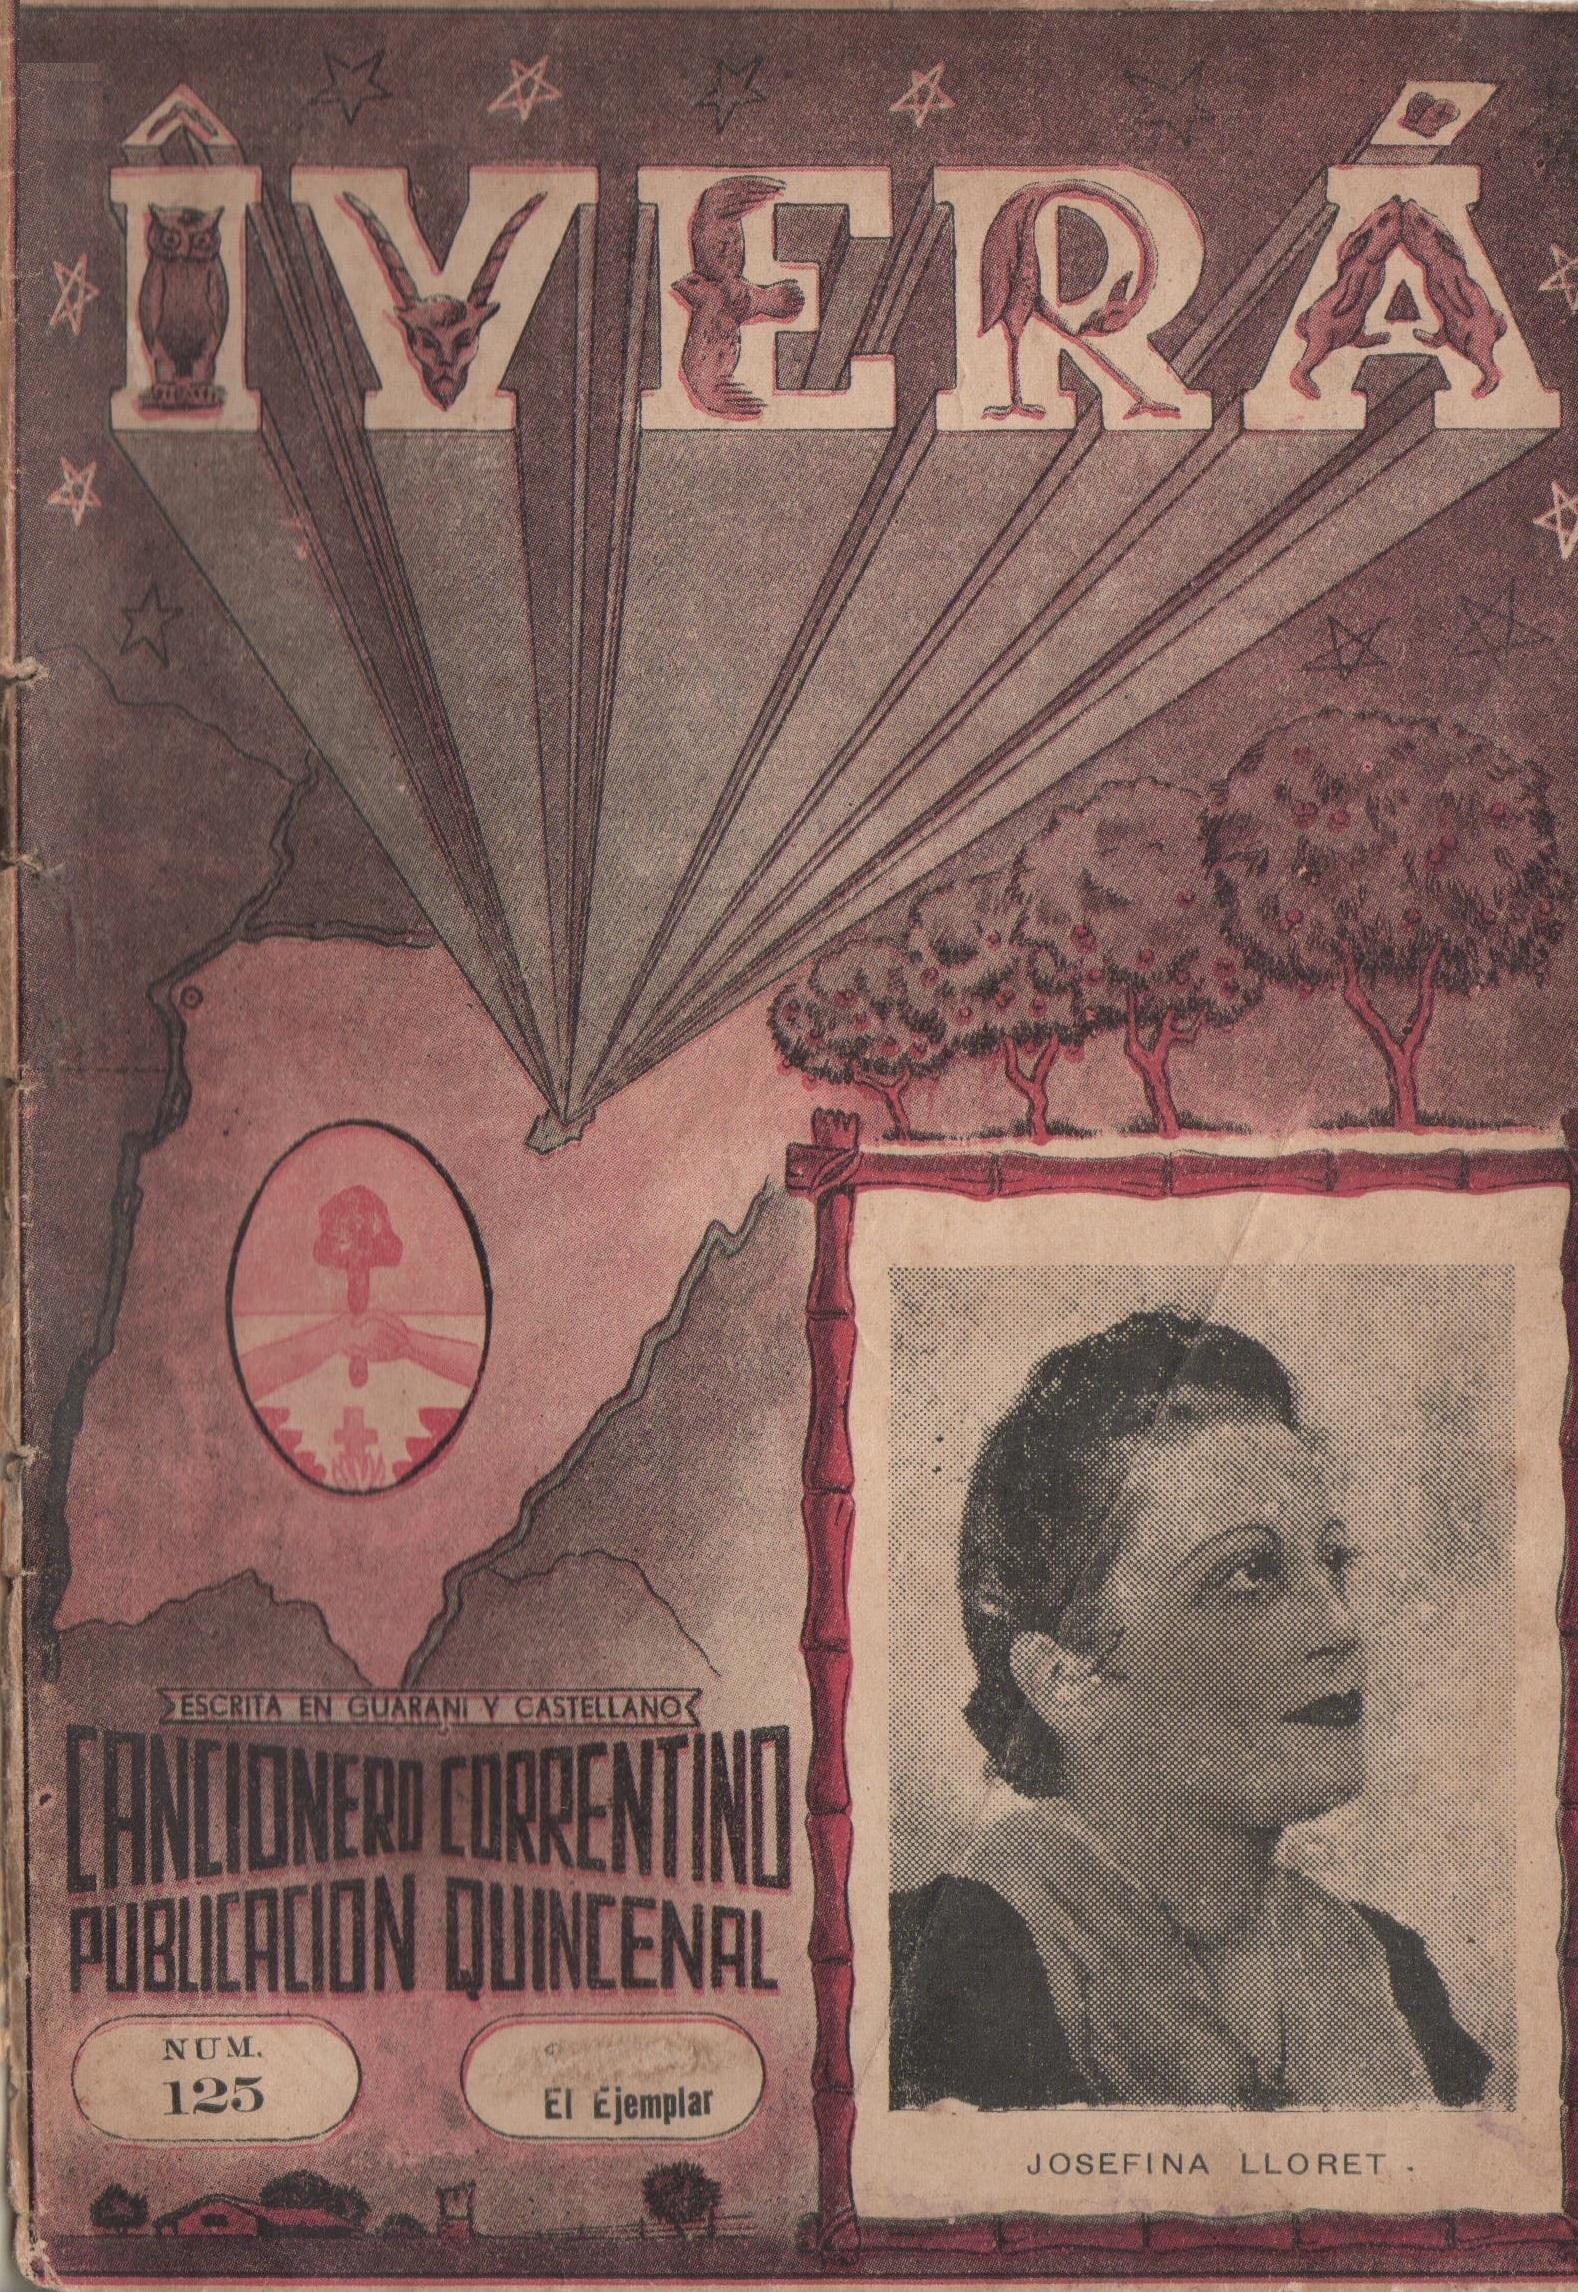 Nº 125 - 15 de Marzo de 1950